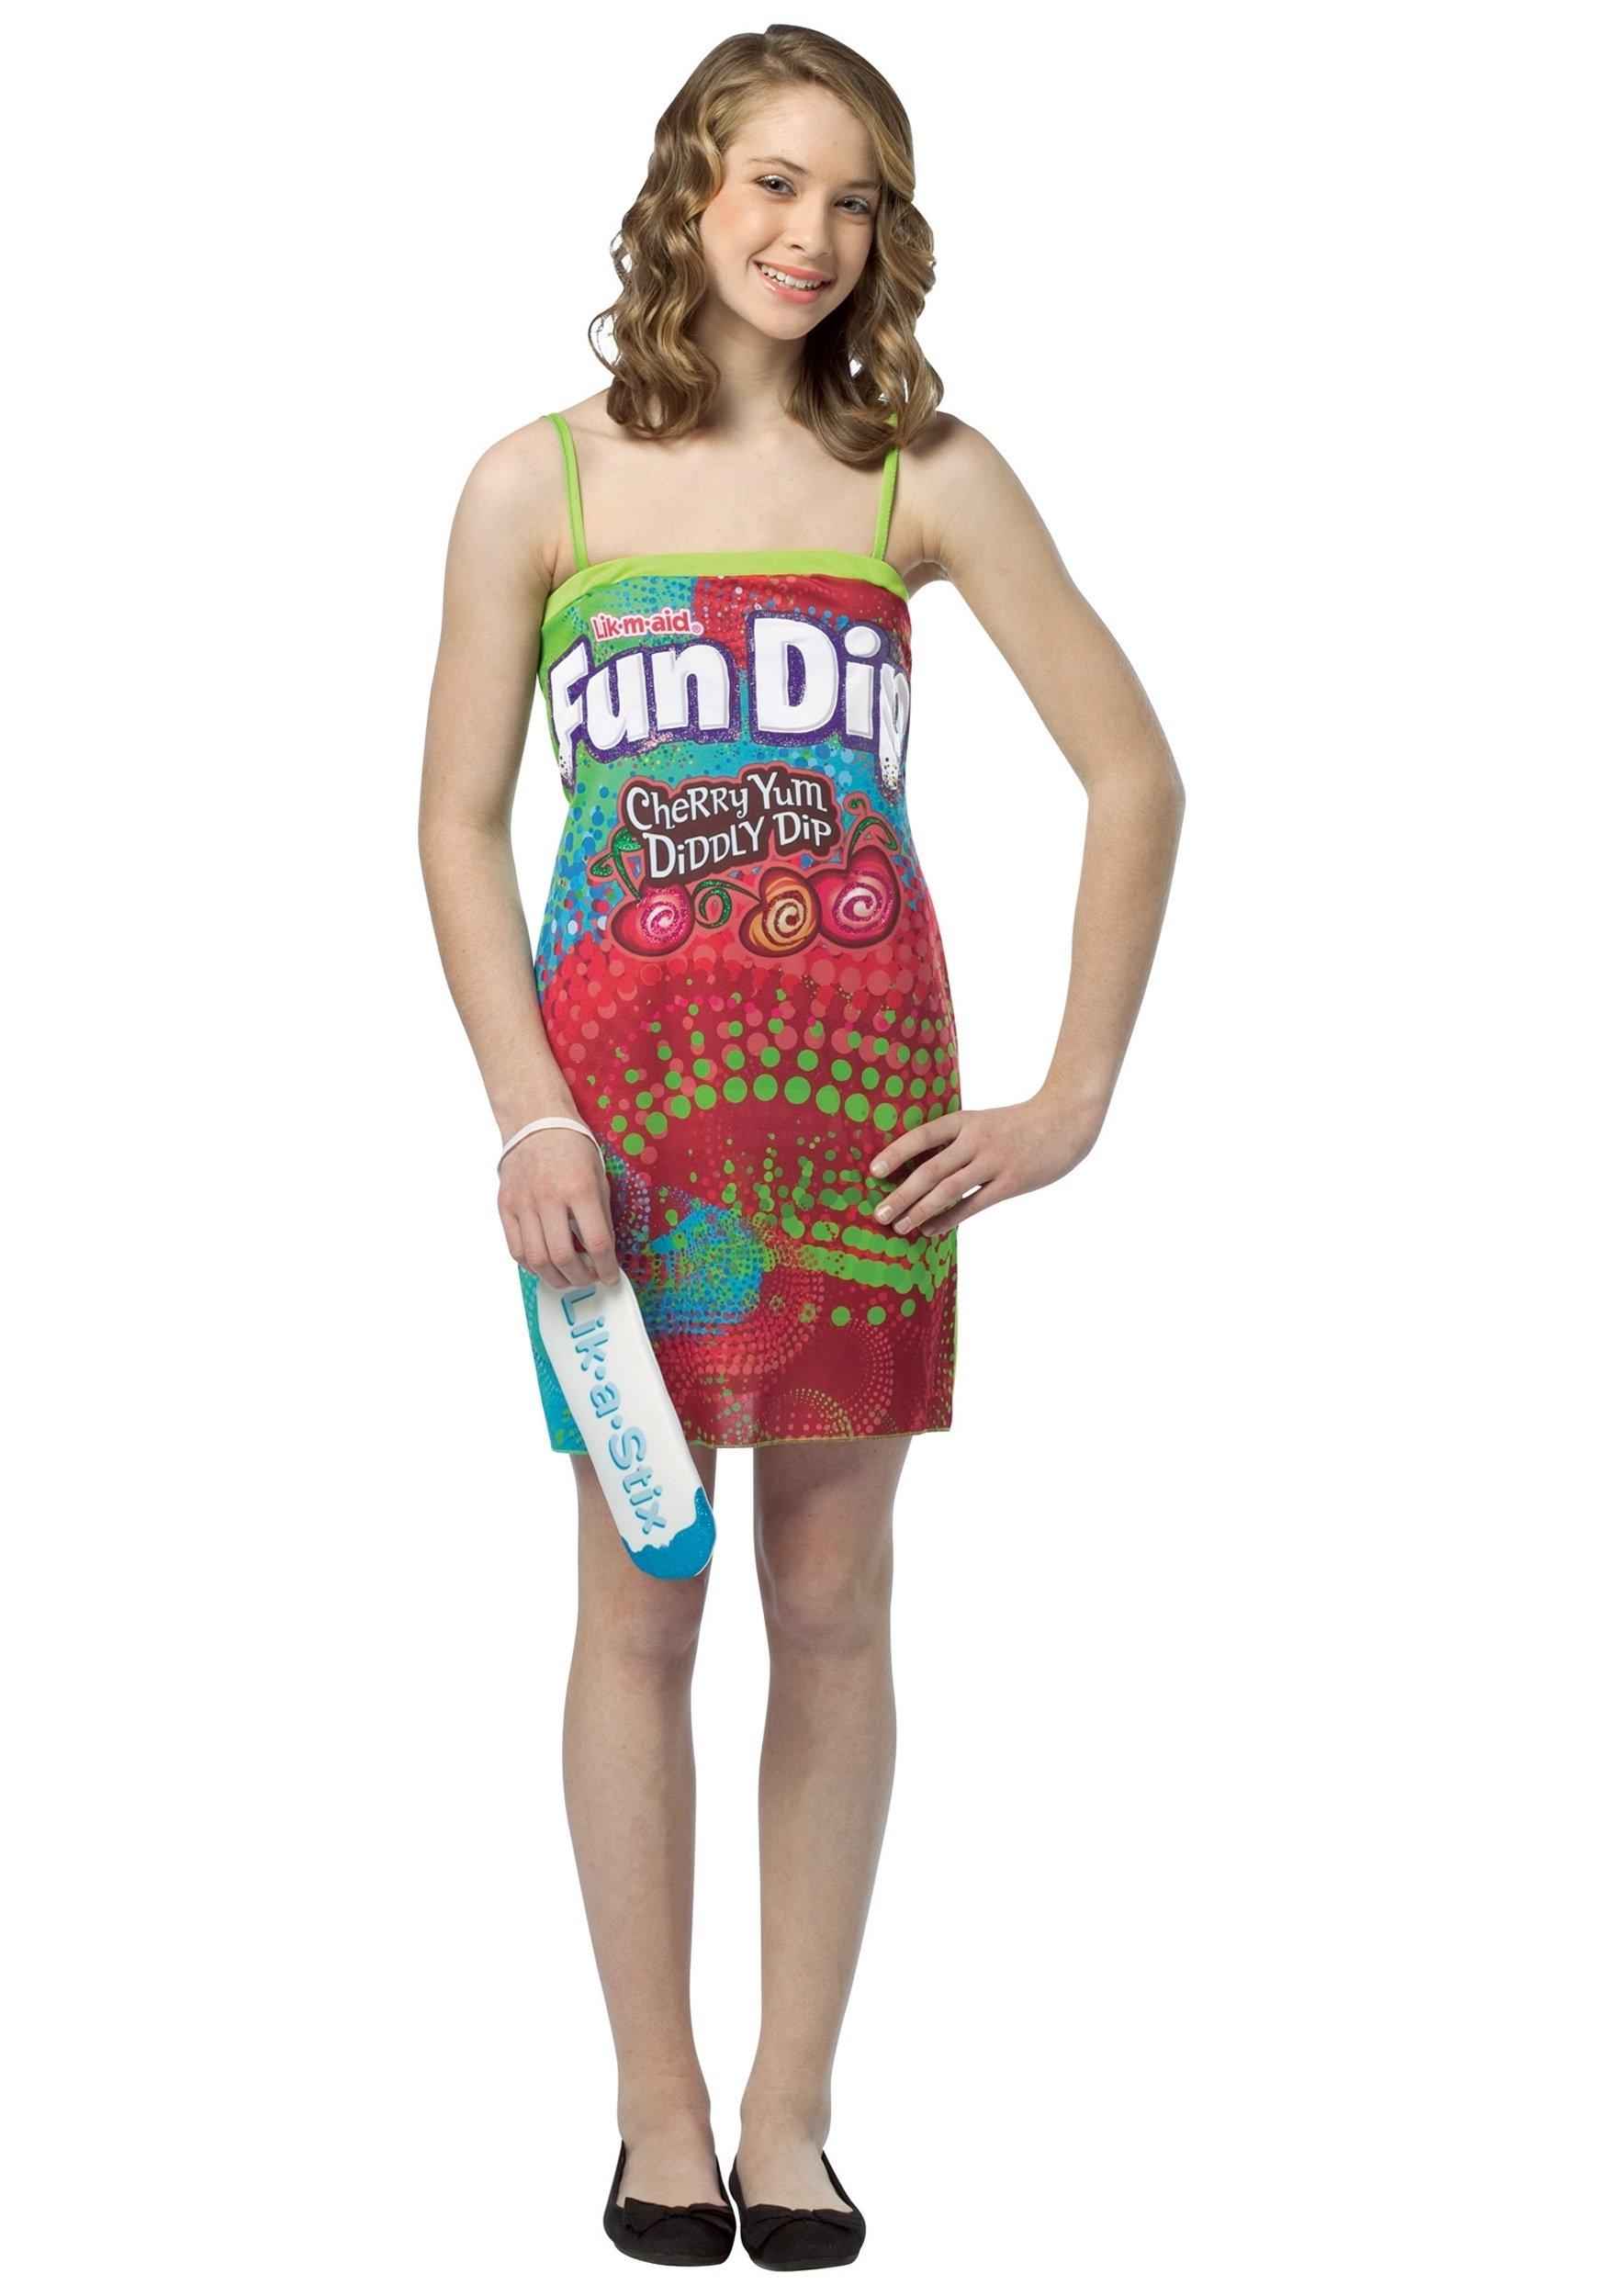 10 Nice Halloween Costume Ideas For Teenage Girls teen fun dip dress halloween pinterest teen fun fun dip and 12 2021